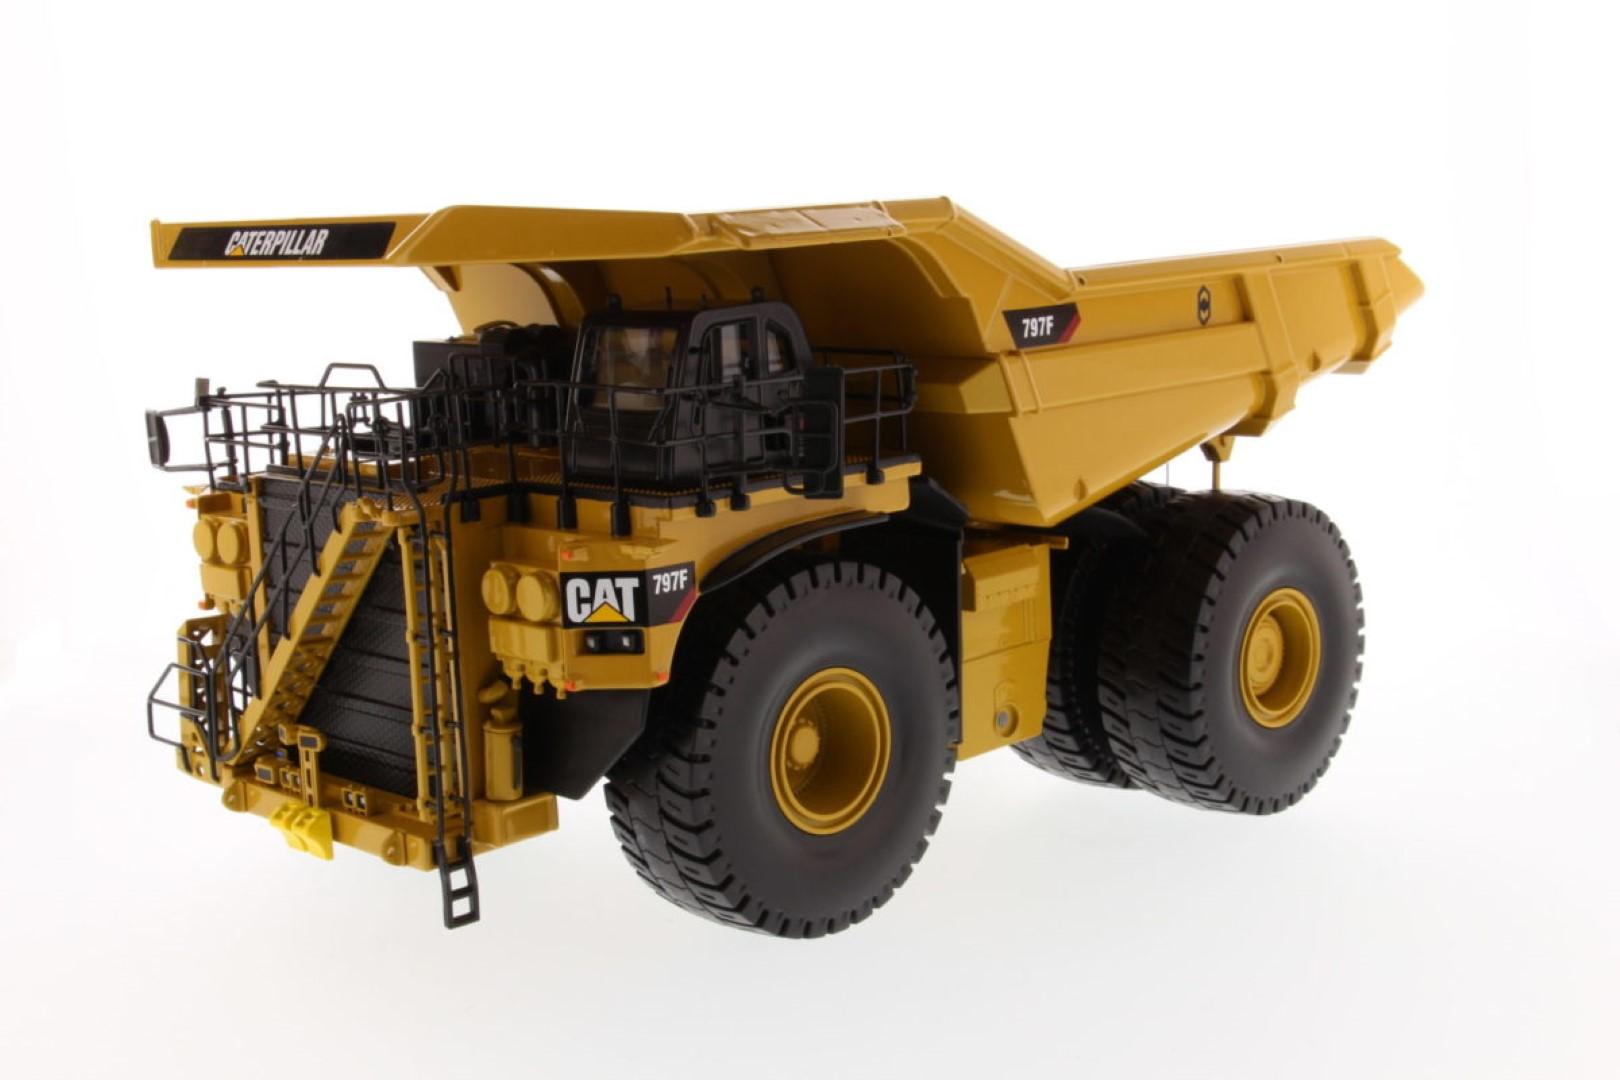 Diecast Masters CAT 797F Tier 4 Mining Truck - Image 2 of 5